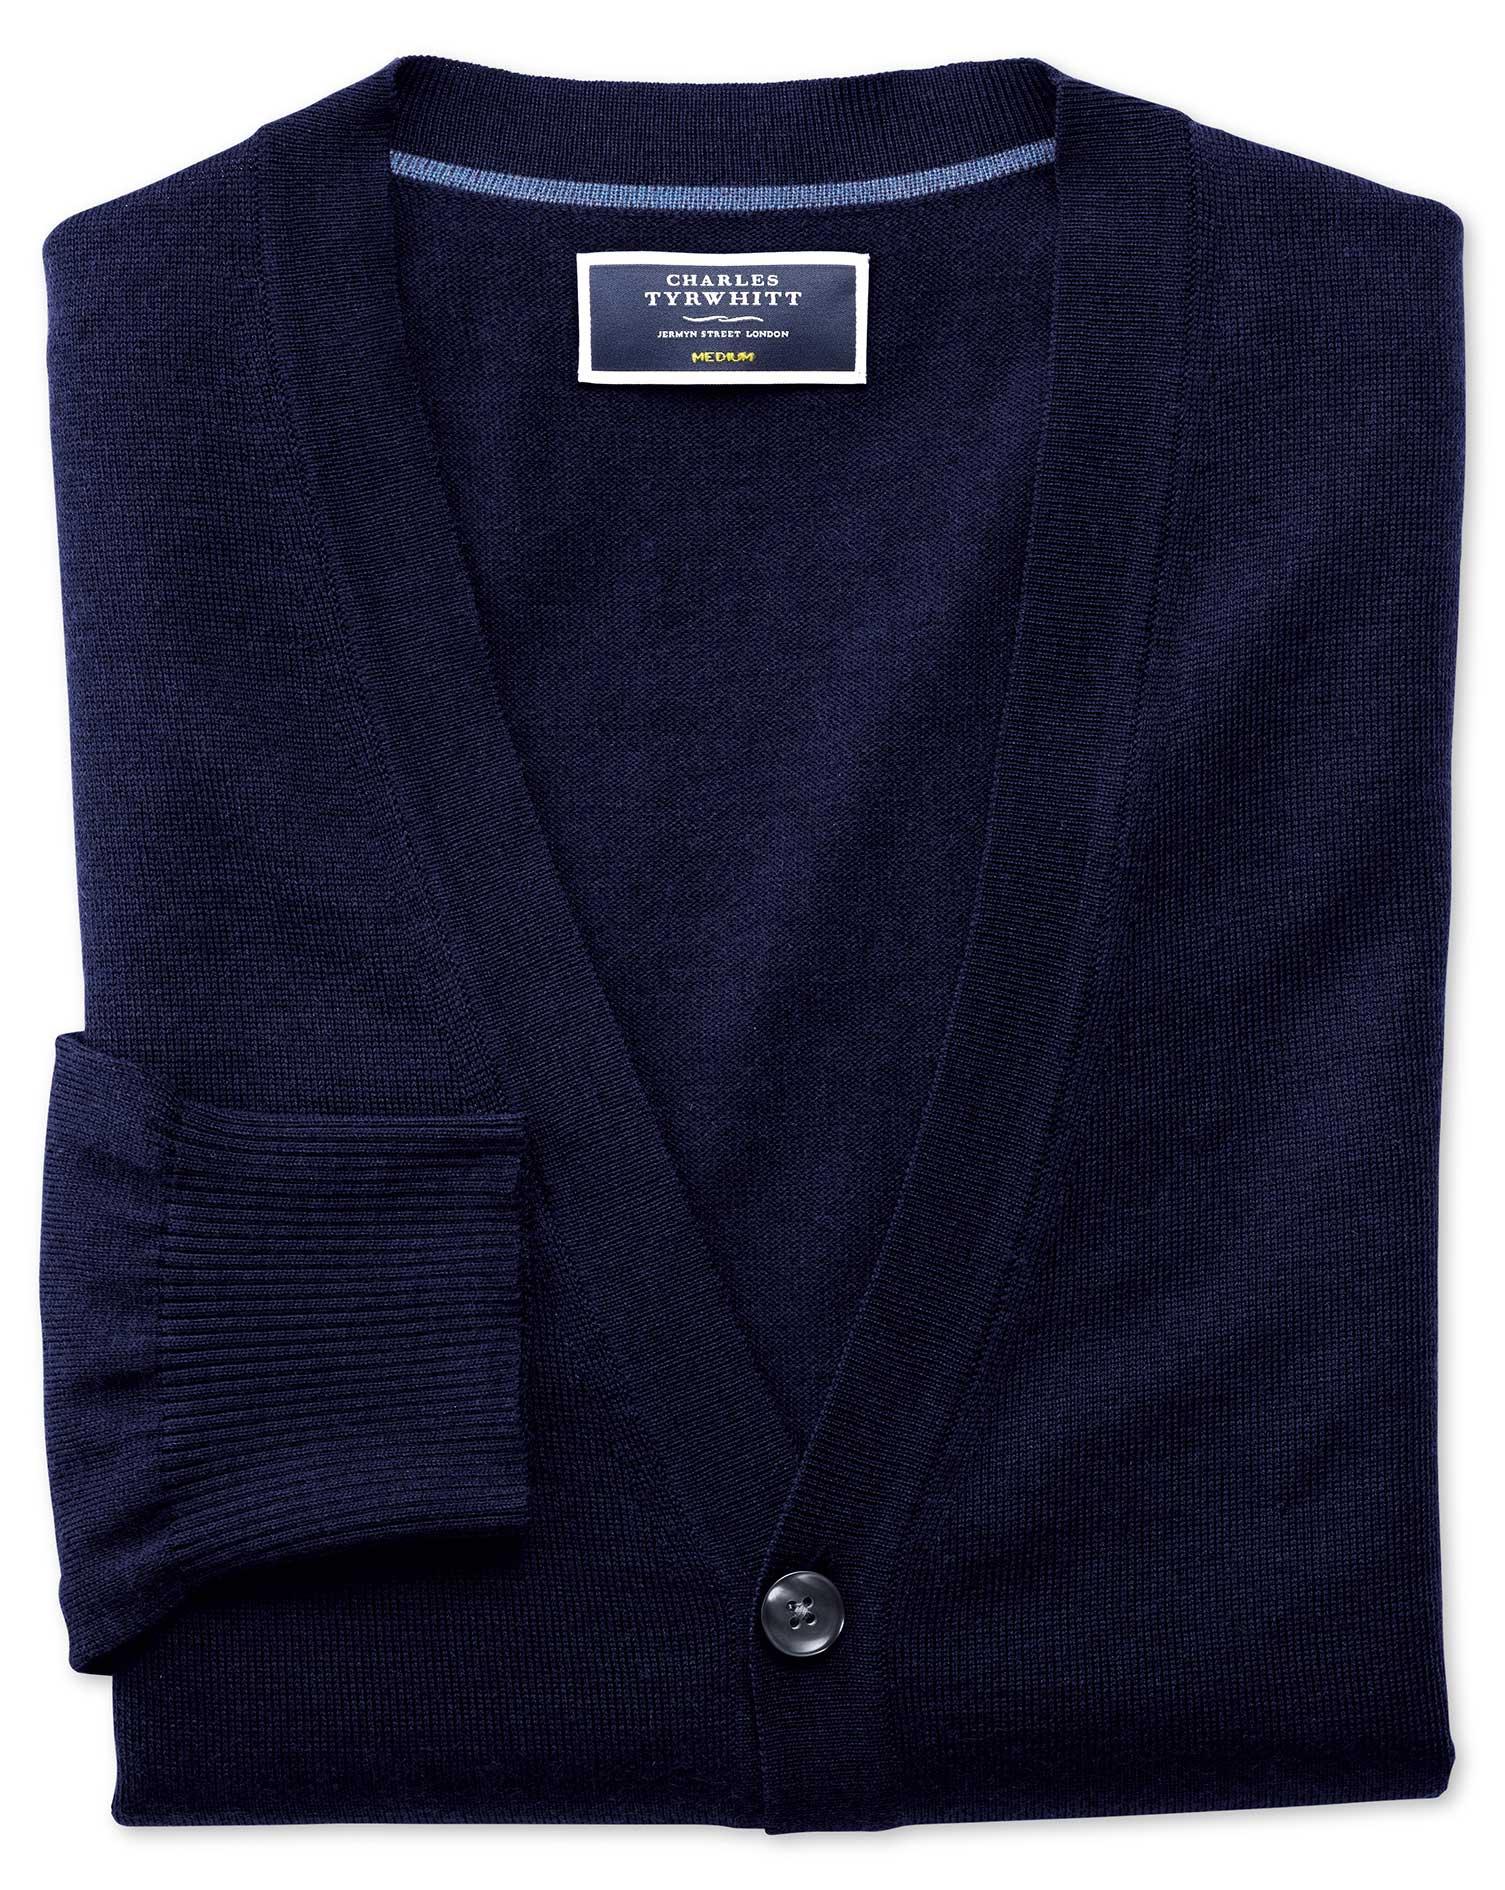 Navy Merino Wool Cardigan Size XL by Charles Tyrwhitt